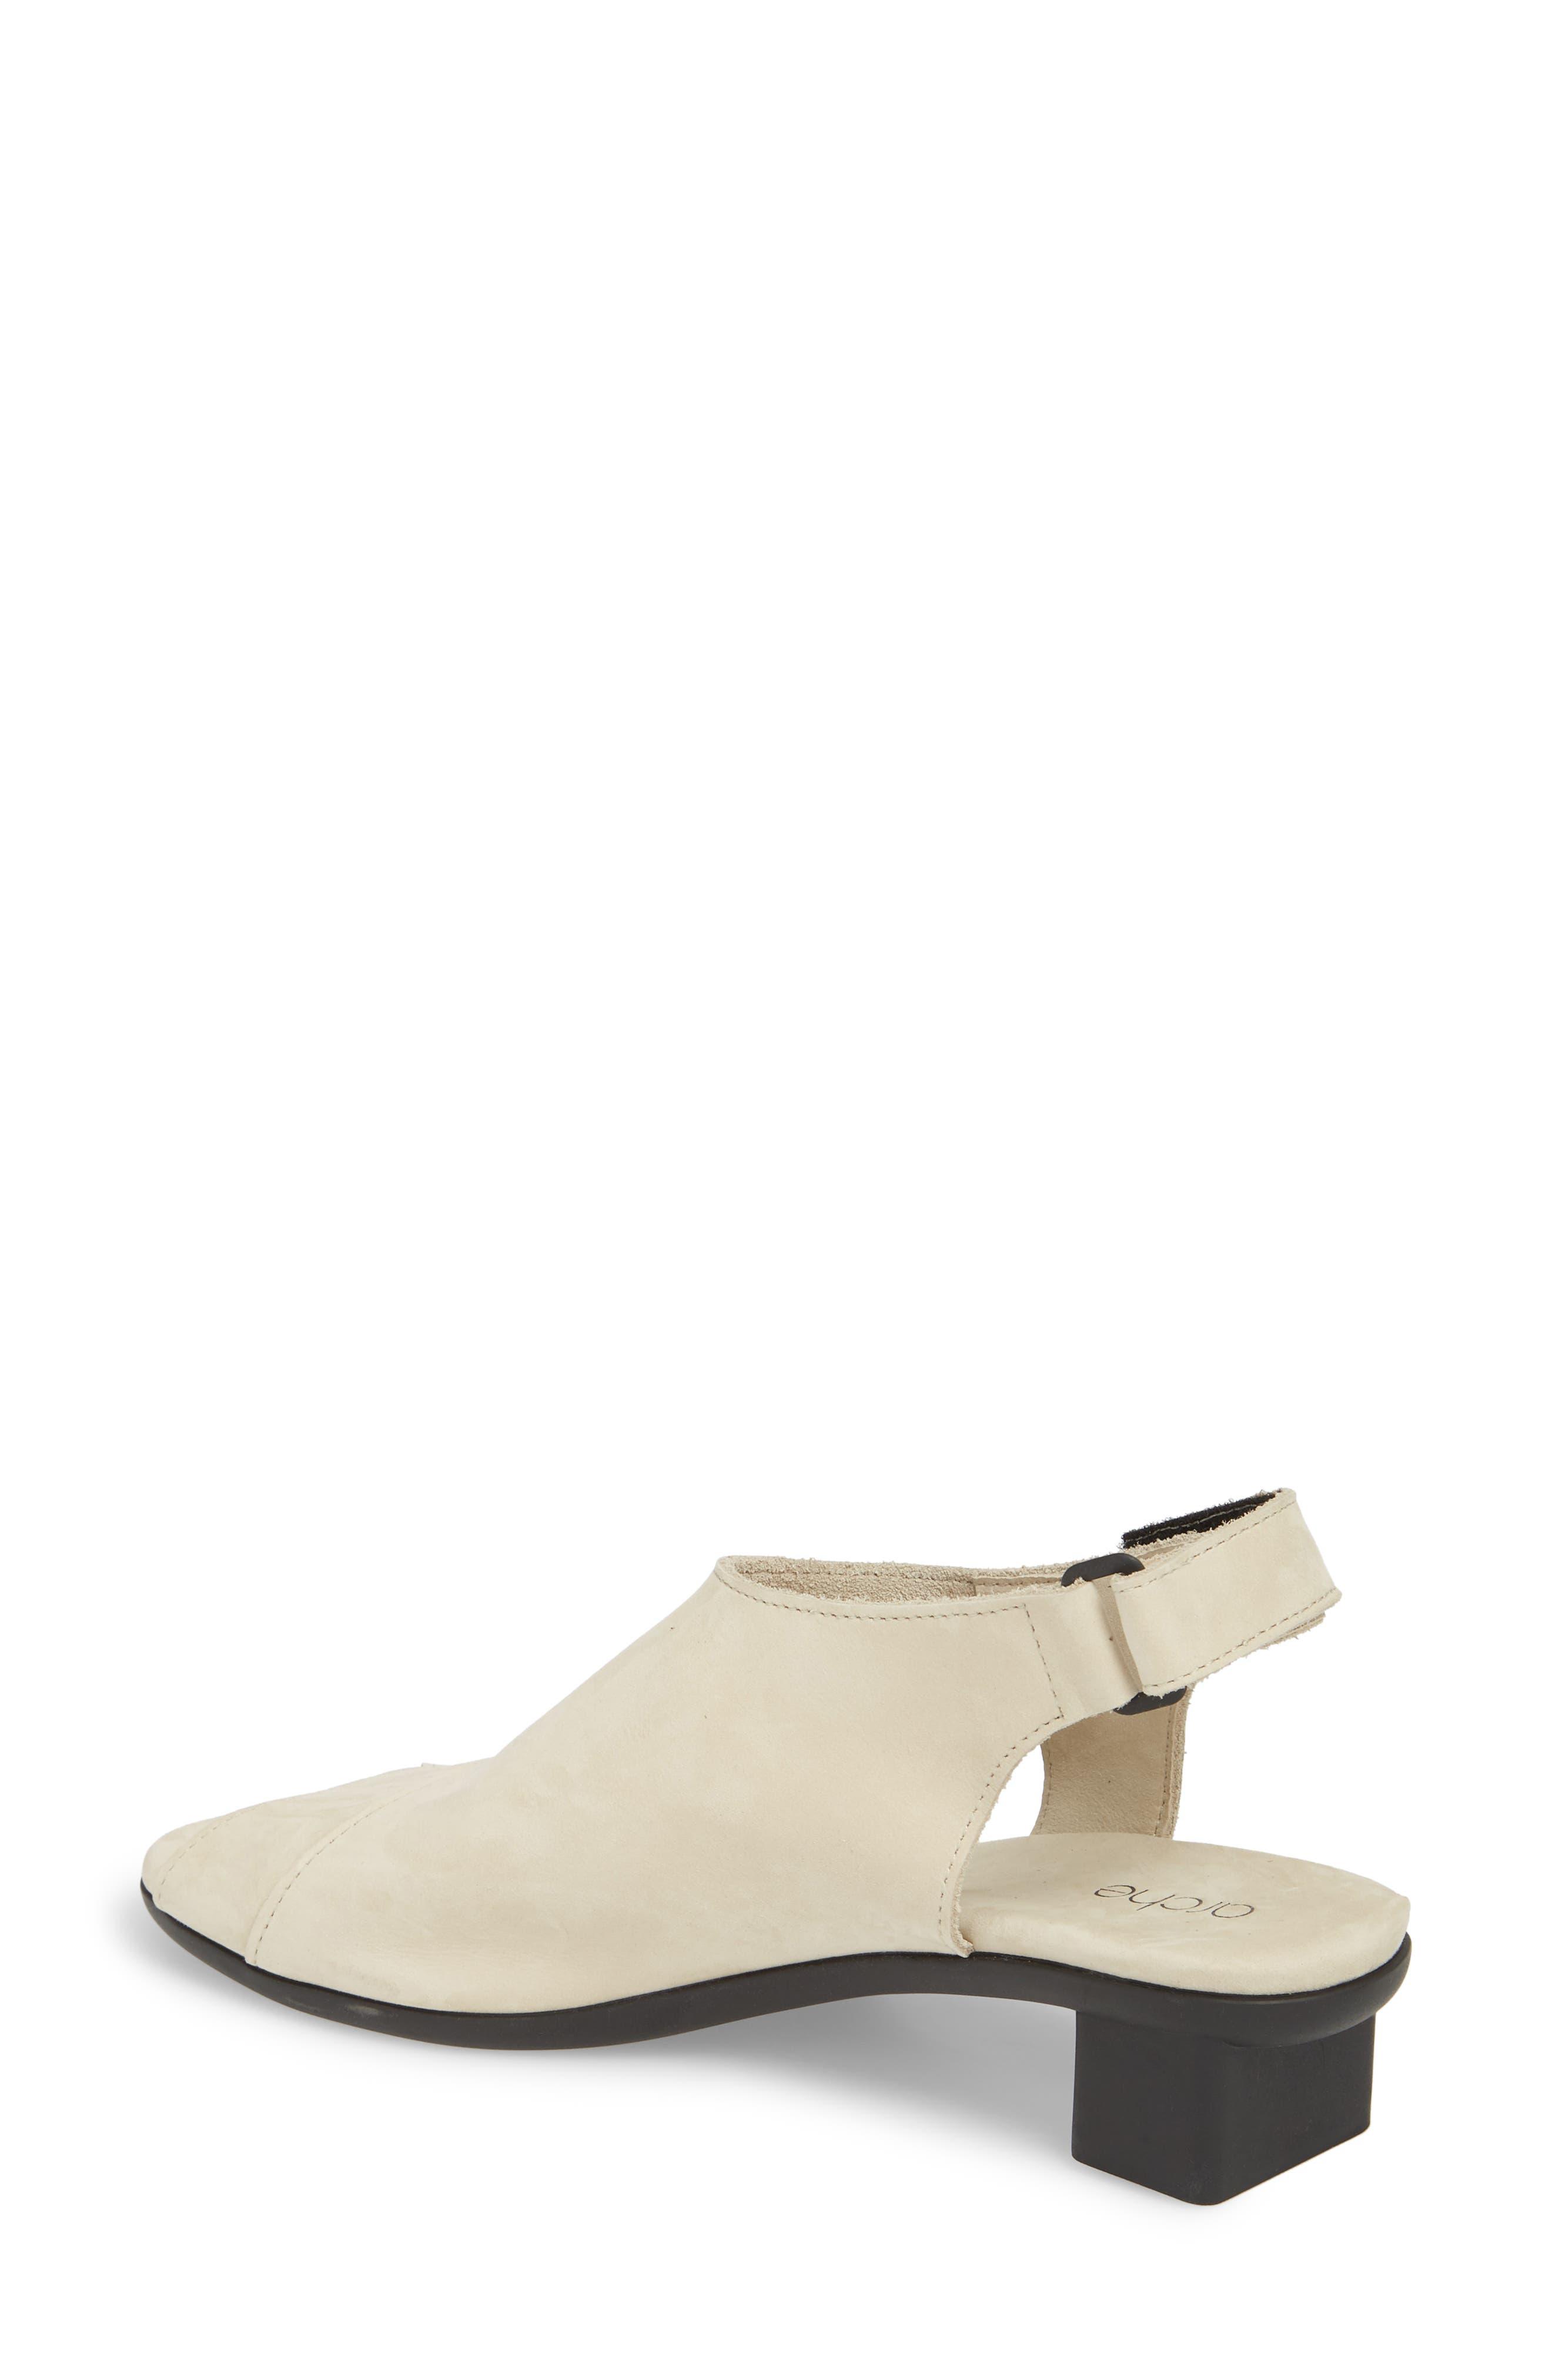 Obibbi Asymmetrical Slingback Sandal,                             Alternate thumbnail 4, color,